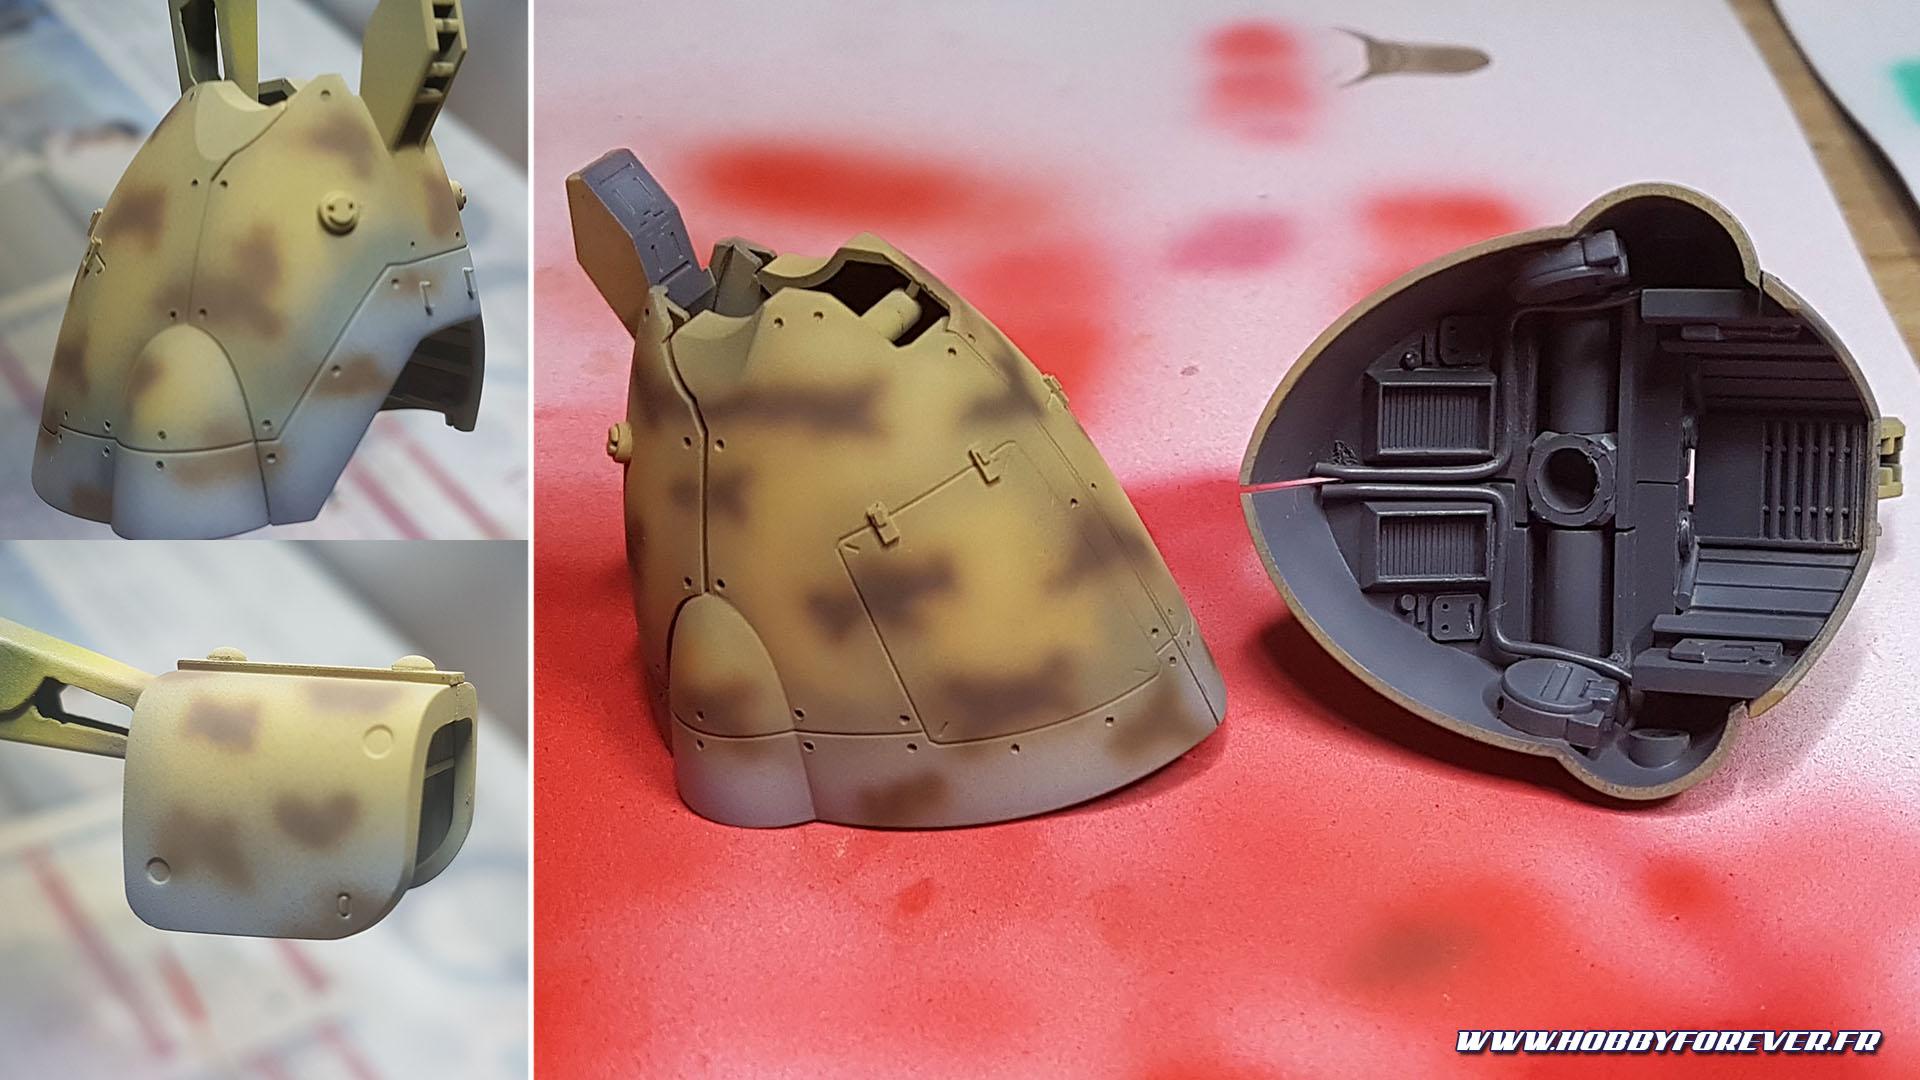 Le Earth Brown AK étant un poil trop clair (photos de gauche), j'ai repris les taches en Flat Brown Tamiya.